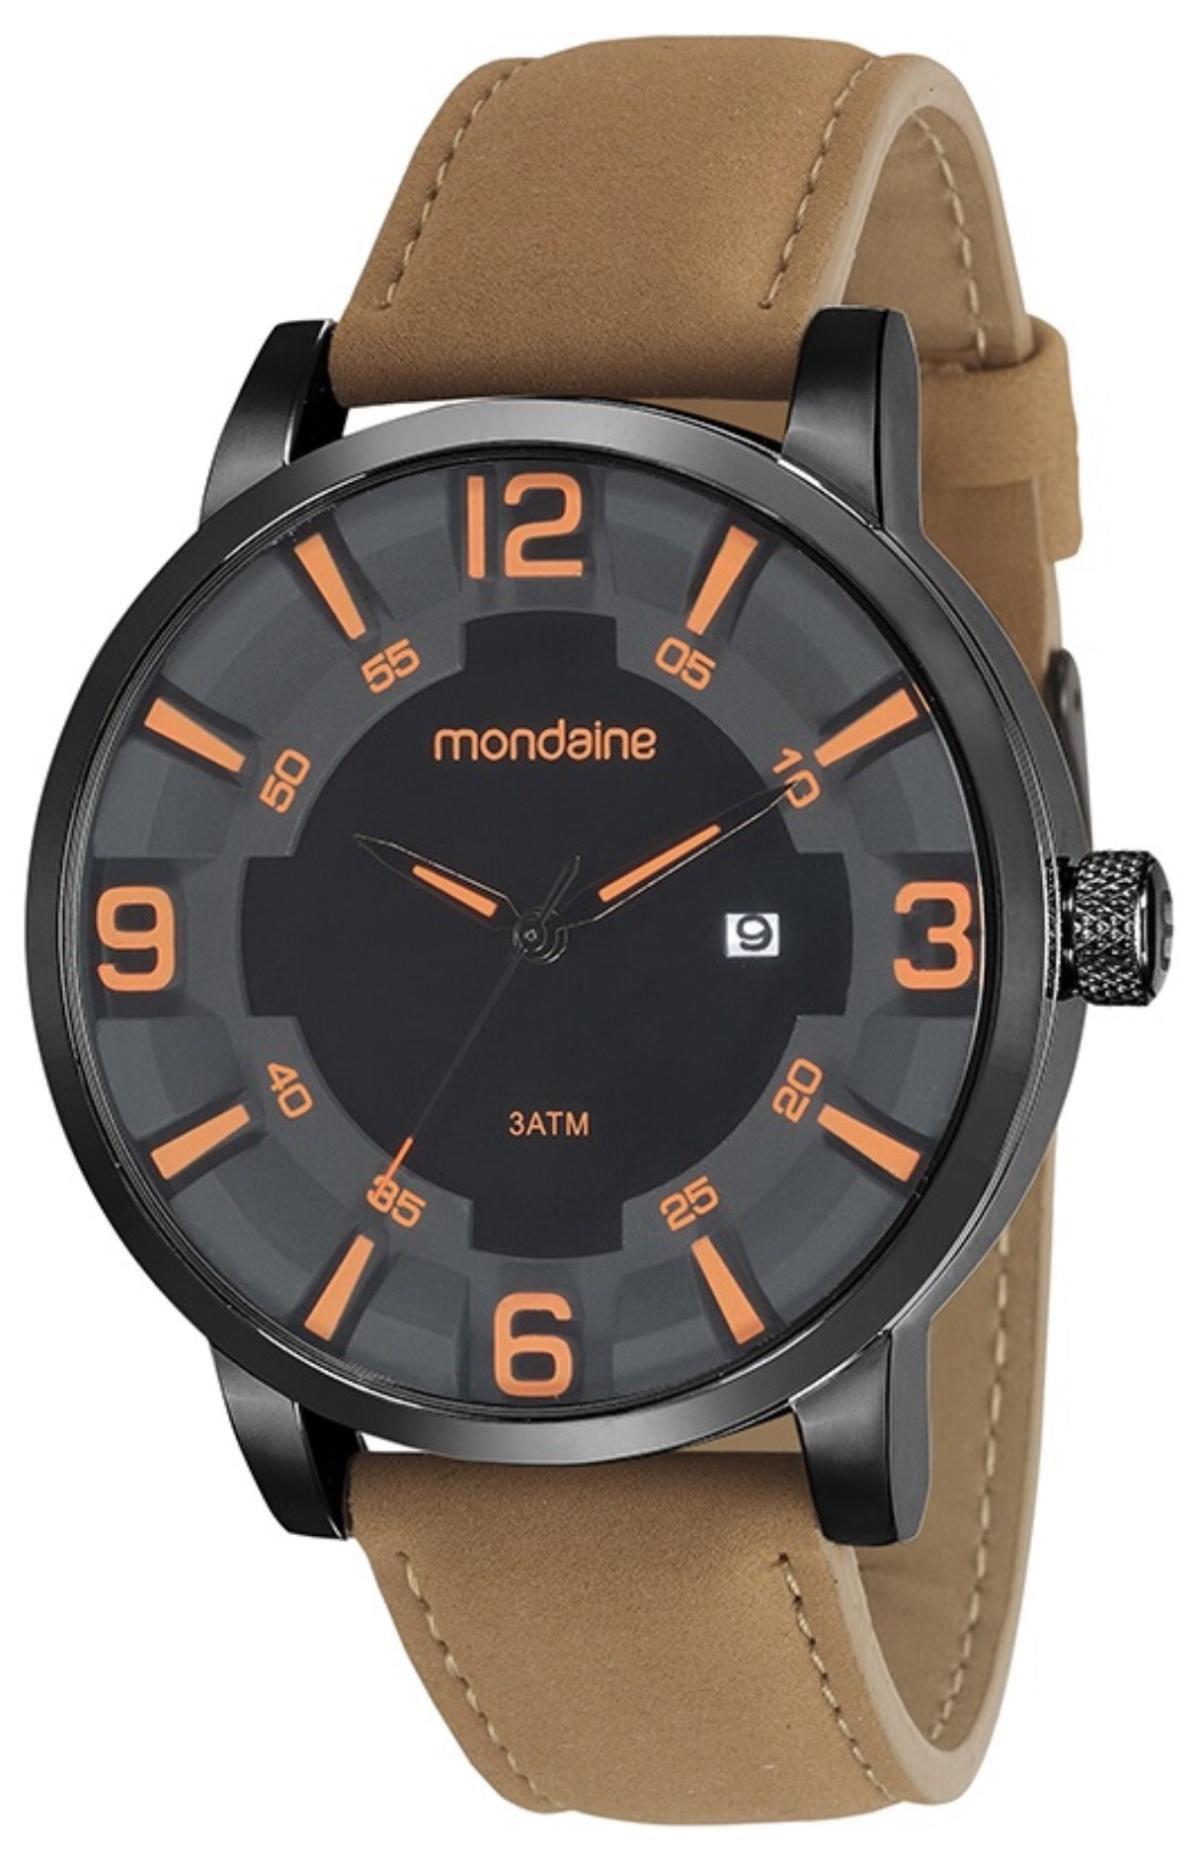 a90b4b1606a0f Relógio Masculino Mondaine 99222GPMVPH2 47mm Pulseira Couro Marrom -  Vitrino Relógios